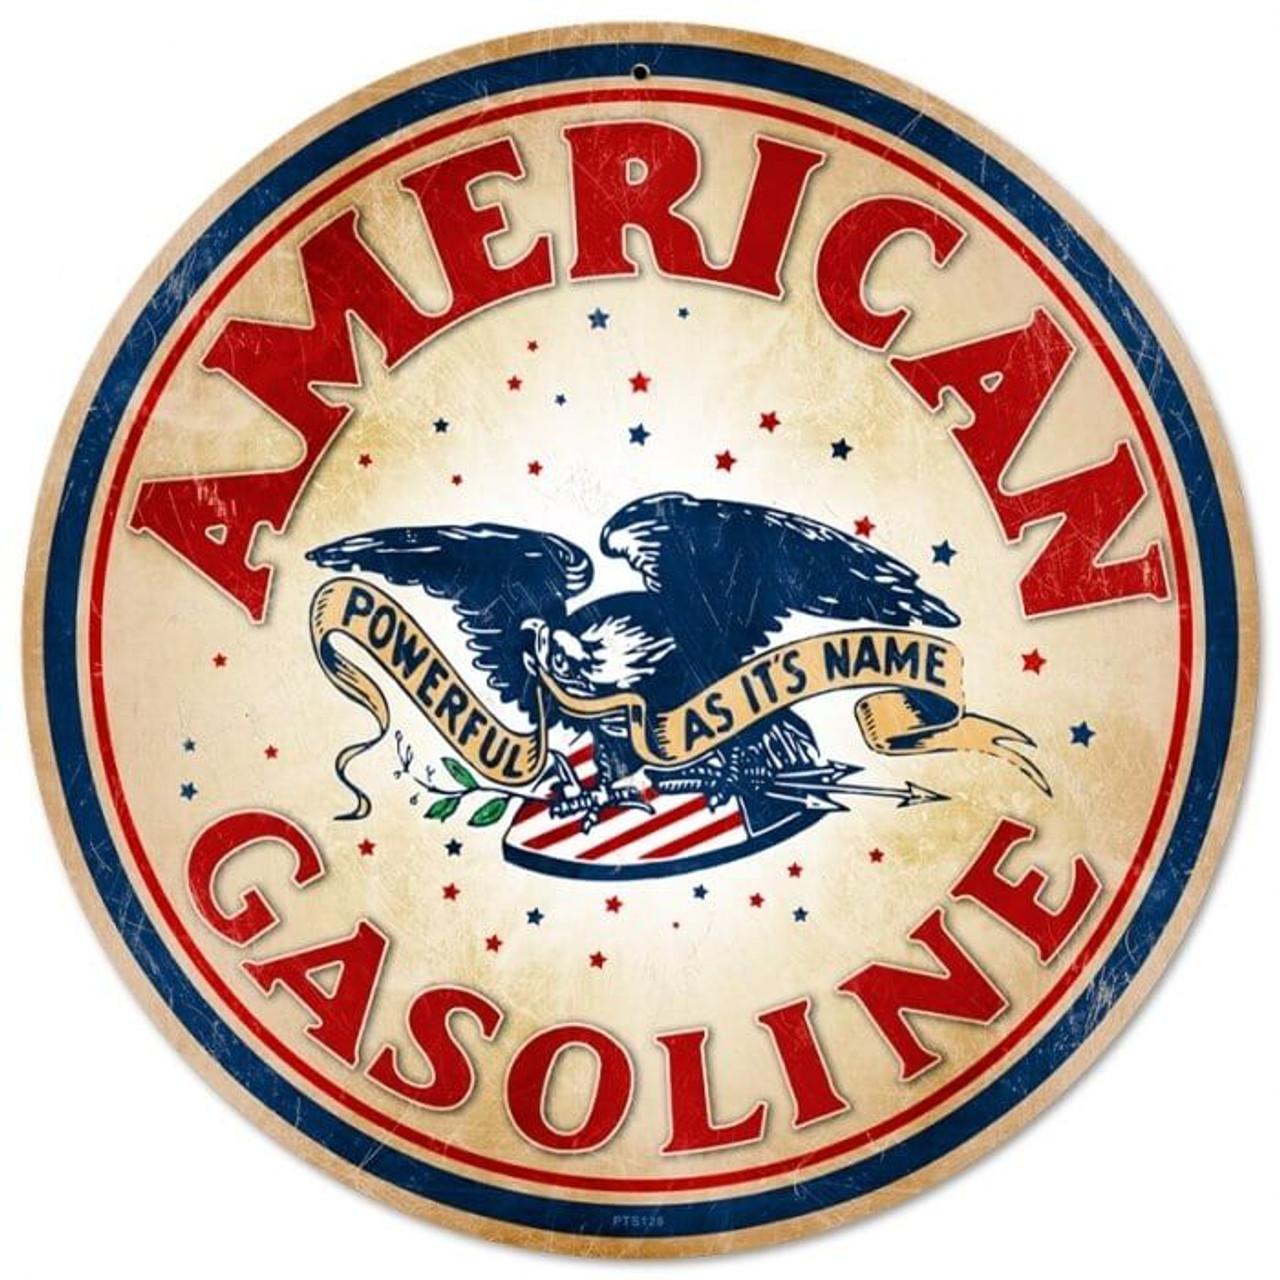 Retro American Gasoline Metal Sign 14 x 14 Inches